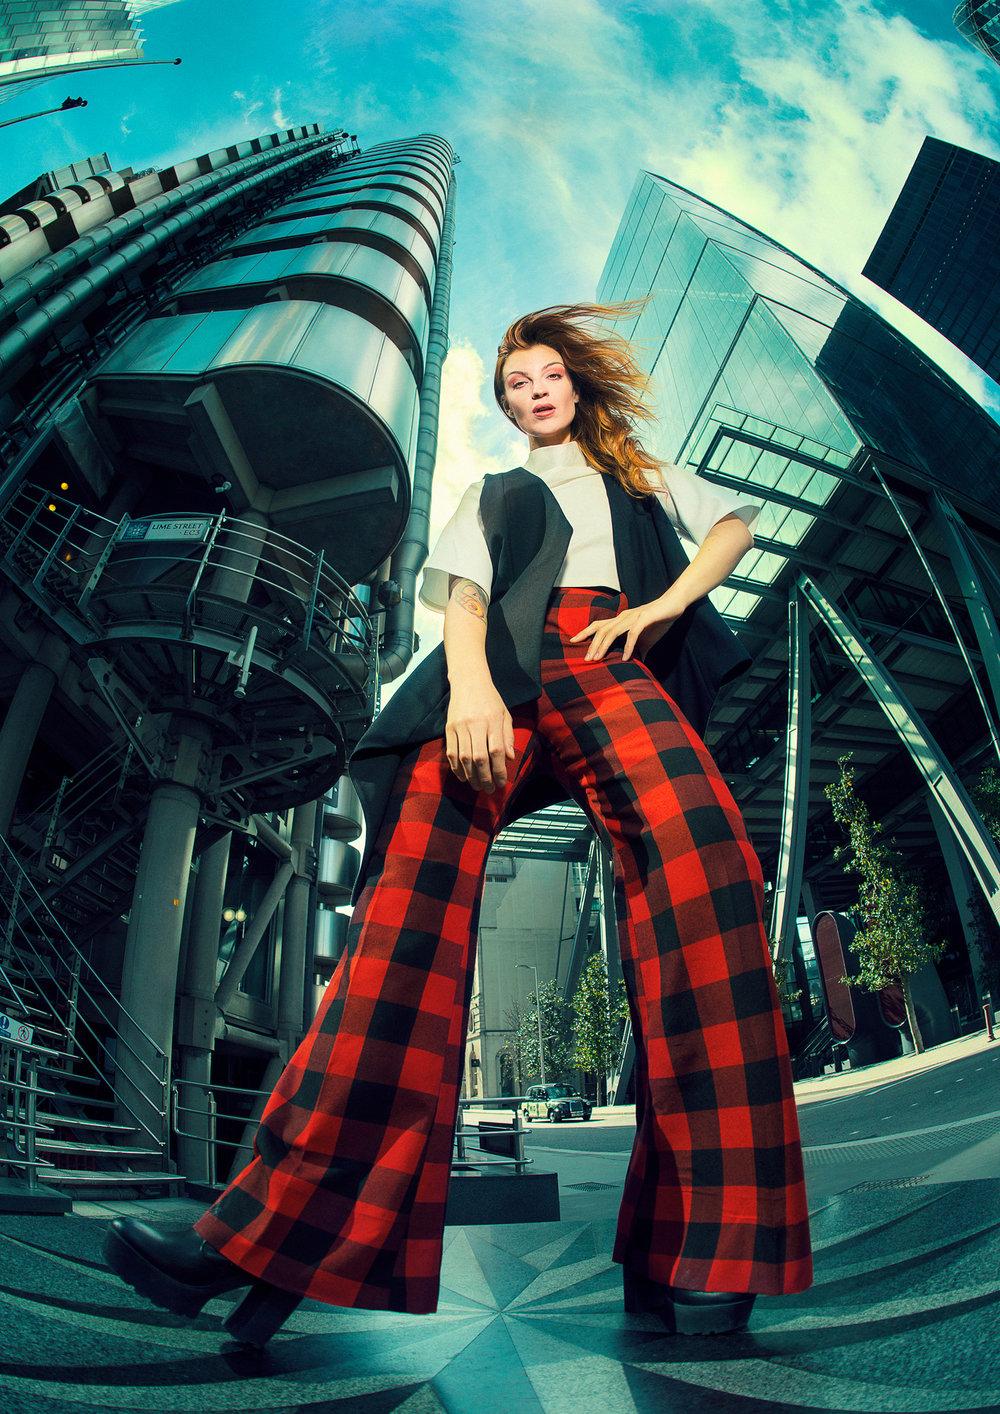 duncan telford, ellements magazine, fashion photography, portrait photography, london photographer